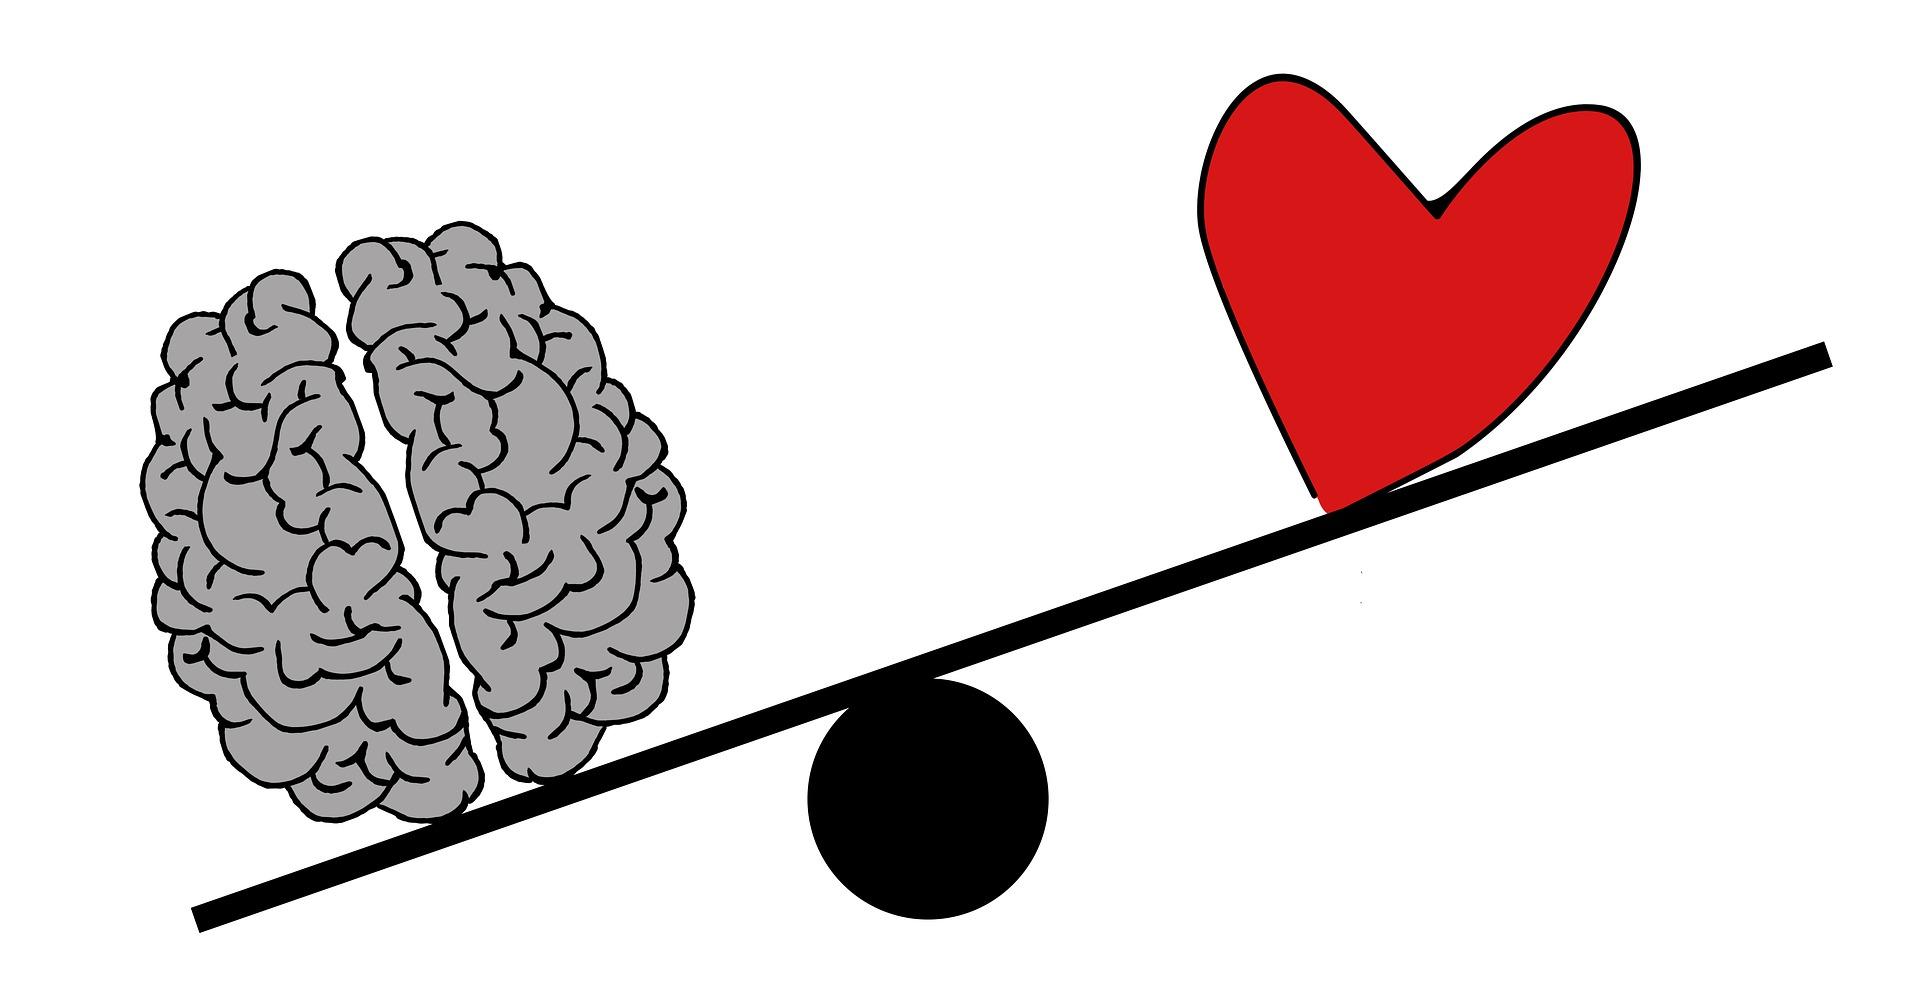 Brain and heart on a seesaw, Brain lower, heart higher